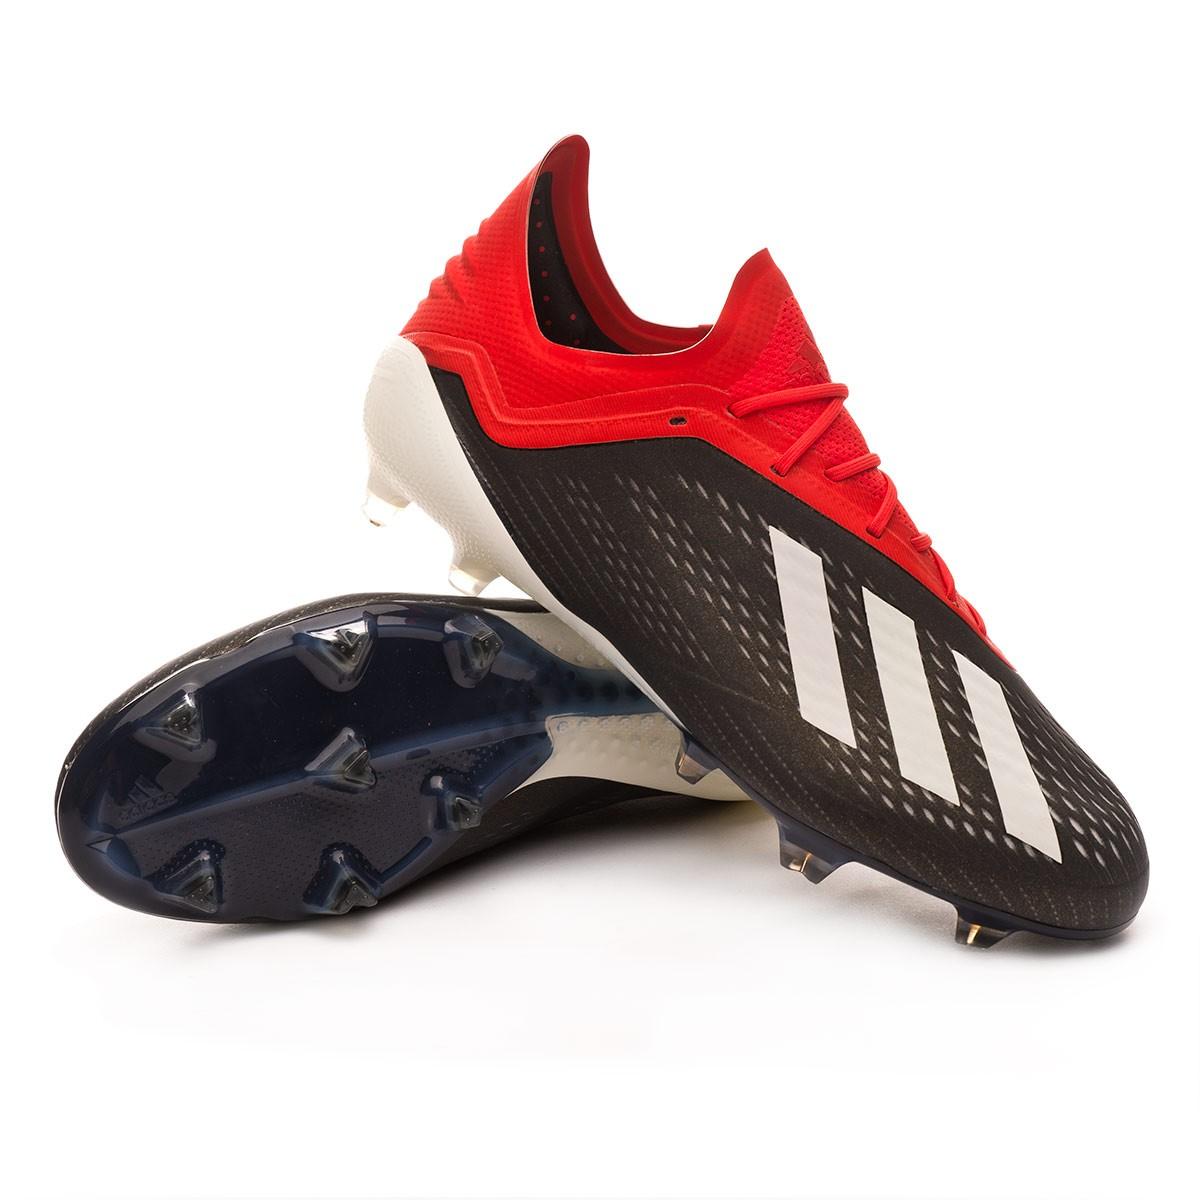 Football Boots adidas X 18.1 FG Core